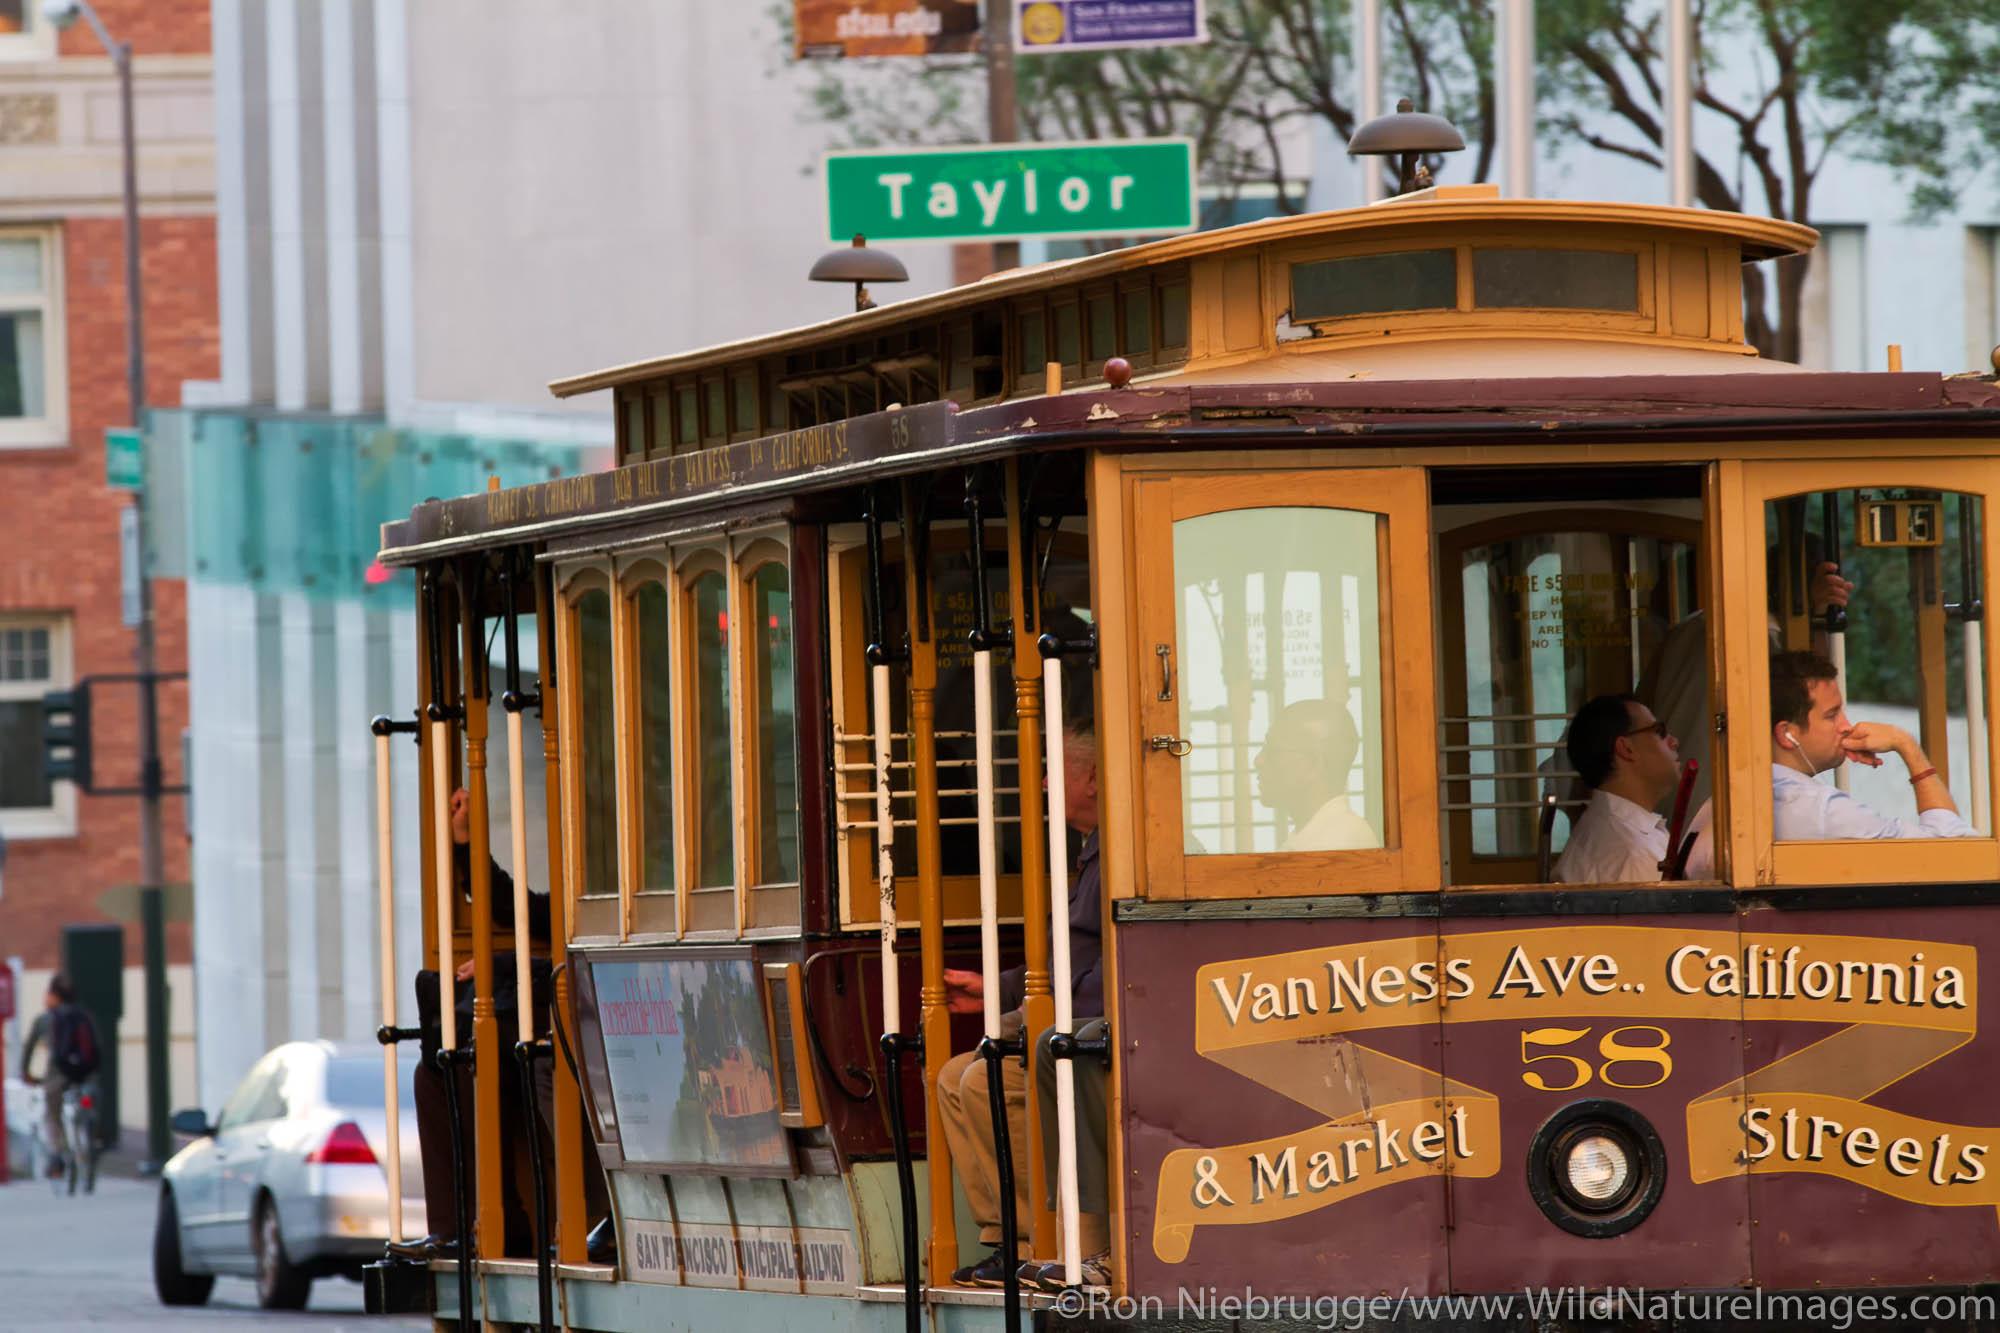 Historic cable car in San Francisco, CA